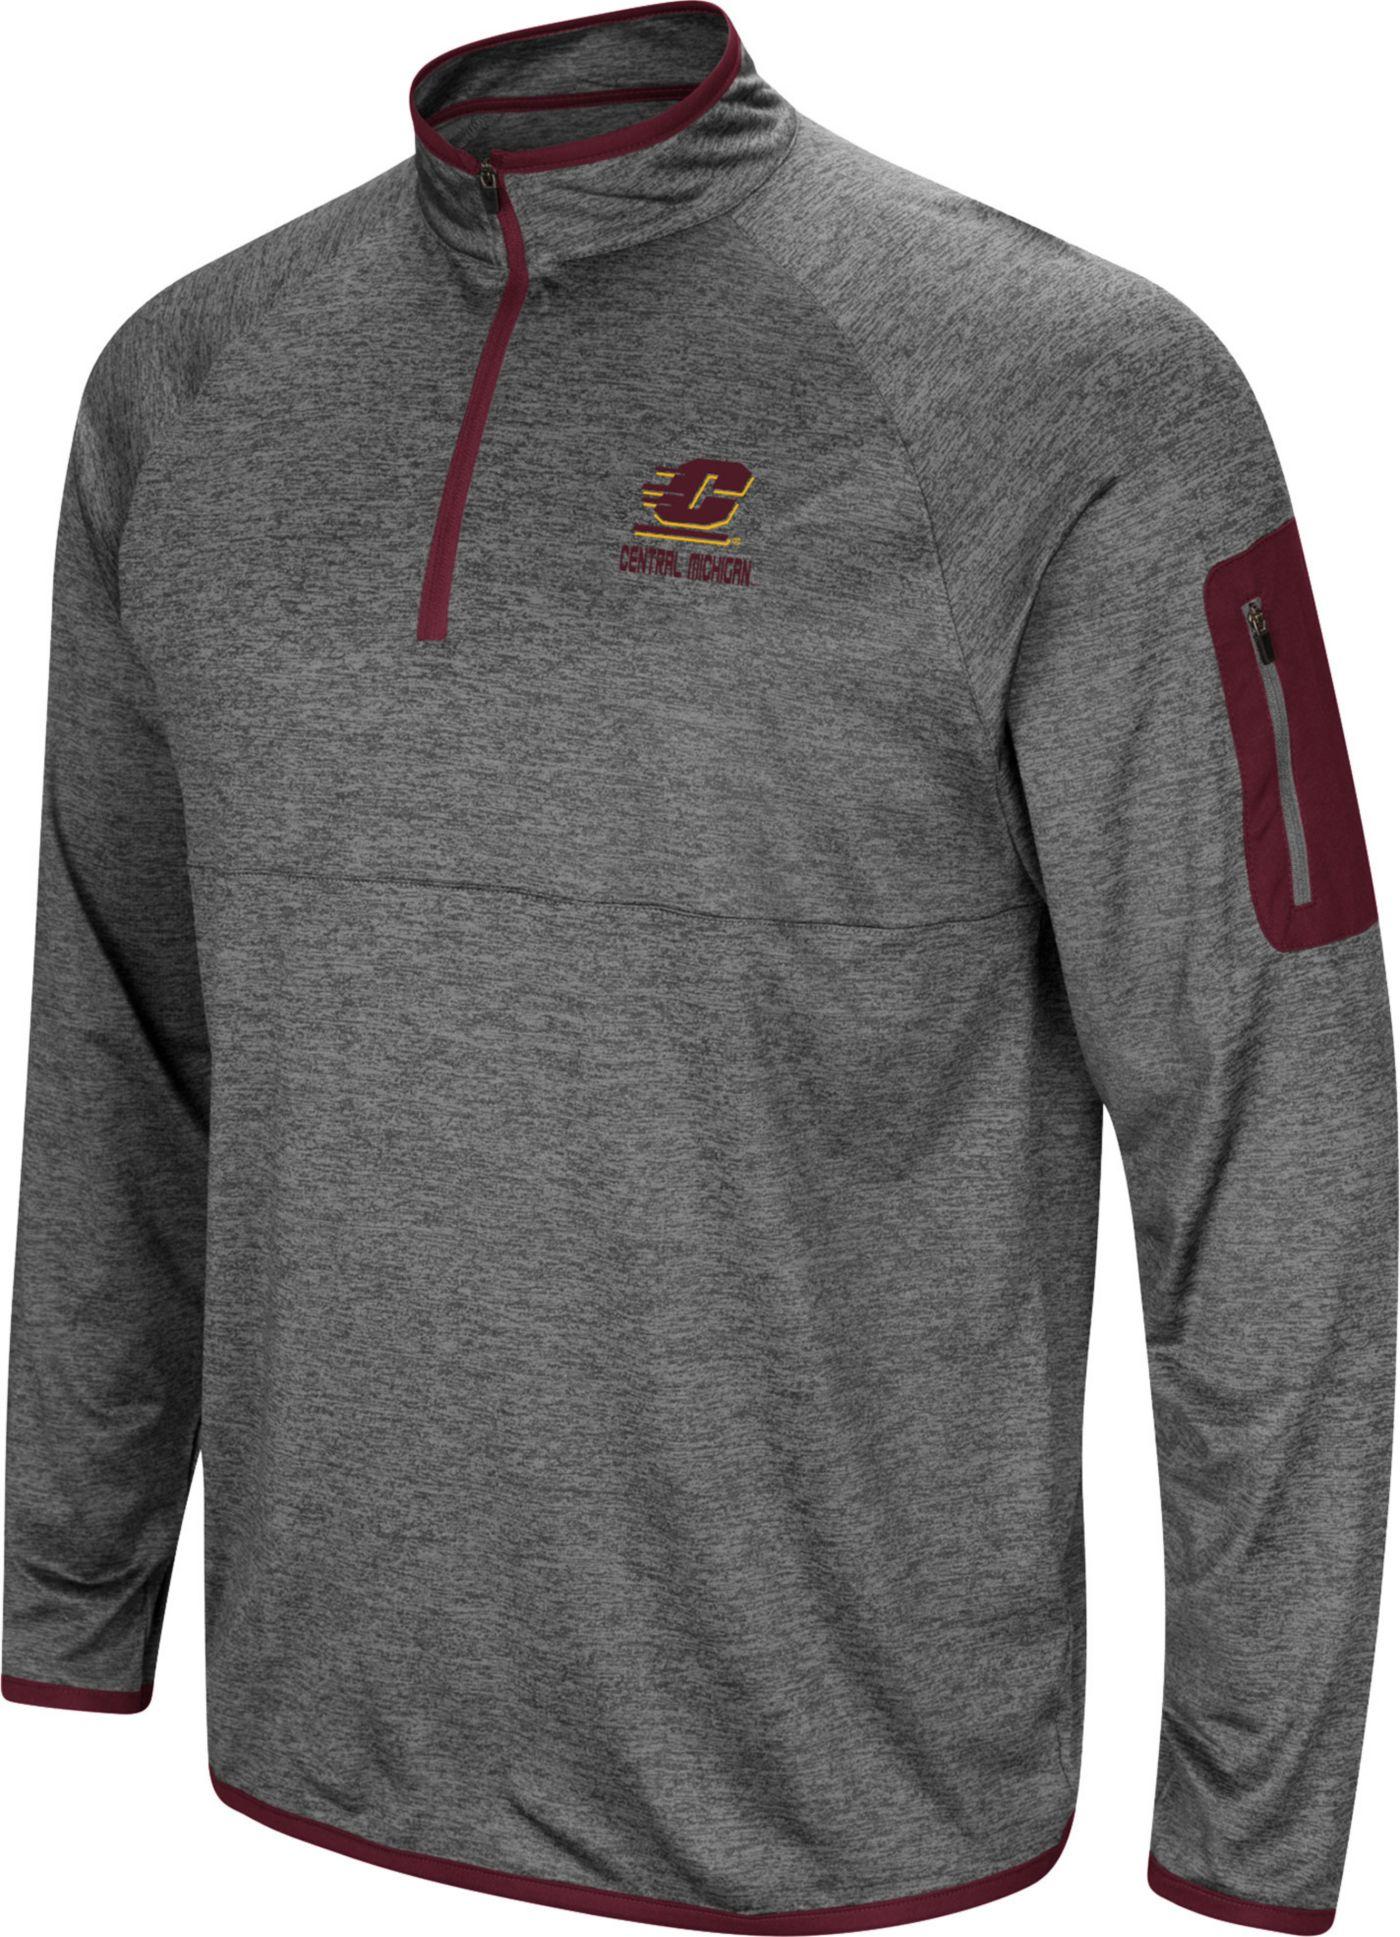 Colosseum Men's Central Michigan Chippewas Grey Indus River Quarter-Zip Shirt